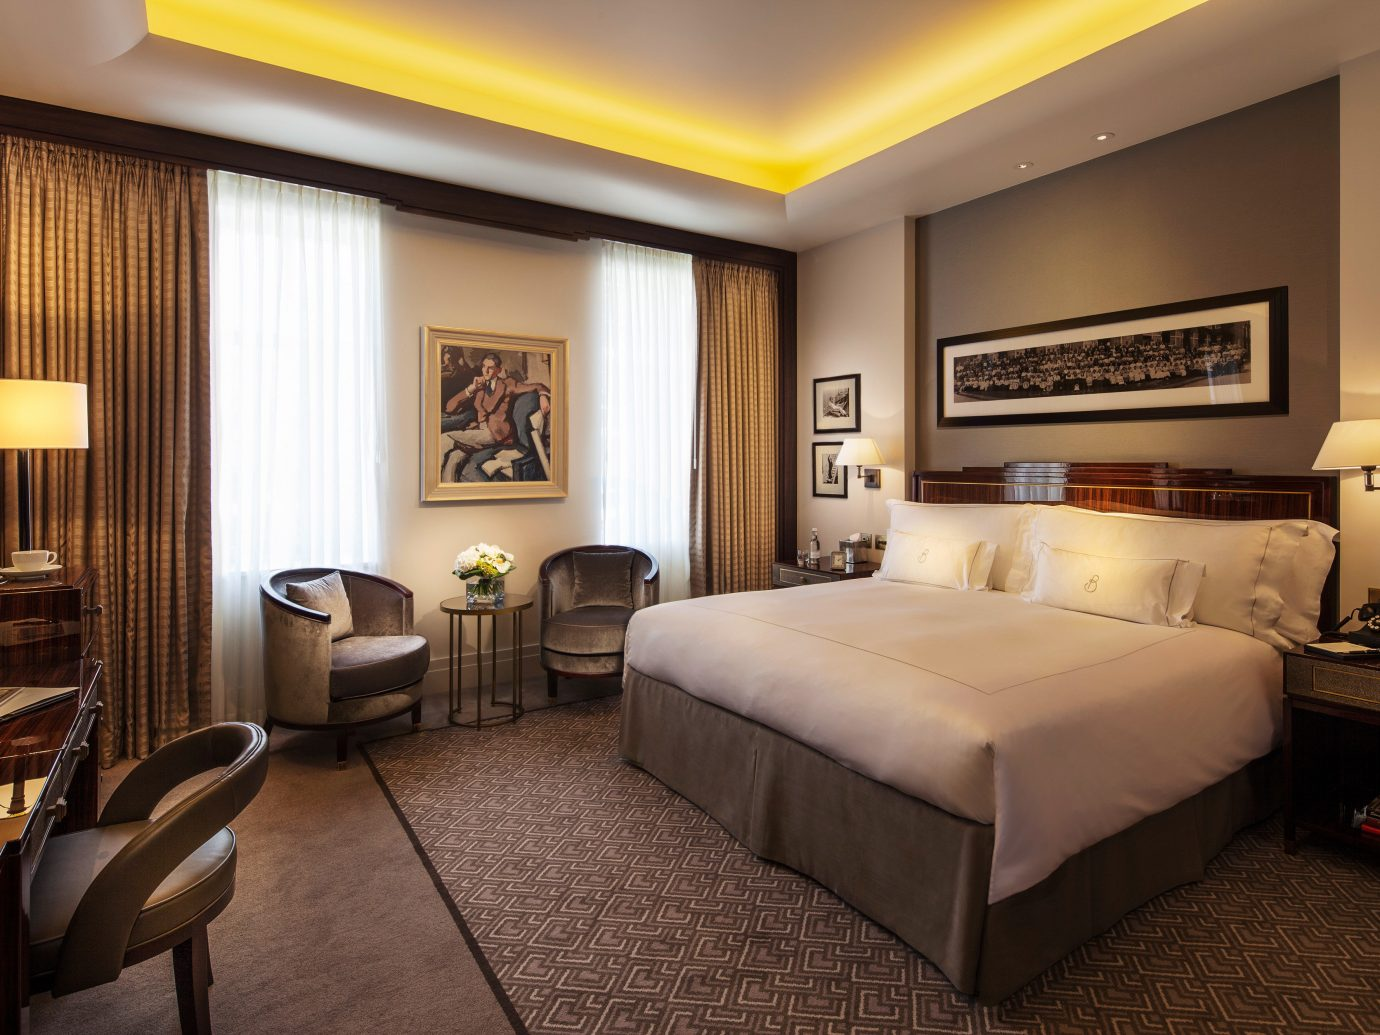 Bath Boutique Hotels Hotels indoor floor wall bed room ceiling hotel property Bedroom Suite interior design estate living room real estate condominium furniture several